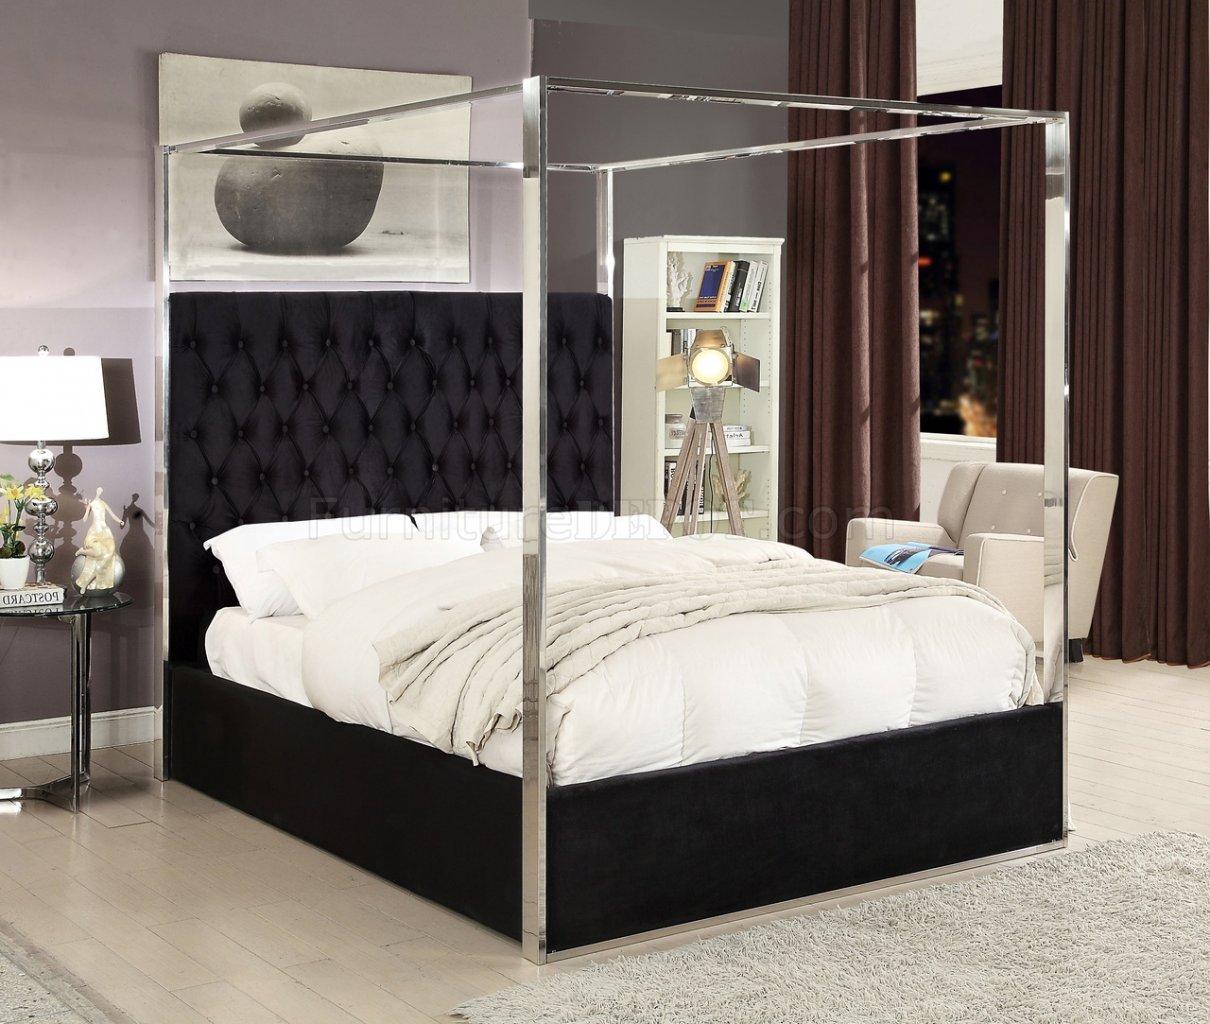 46 deep sofa suede corner bed porter upholstered in black velvet fabric by meridian